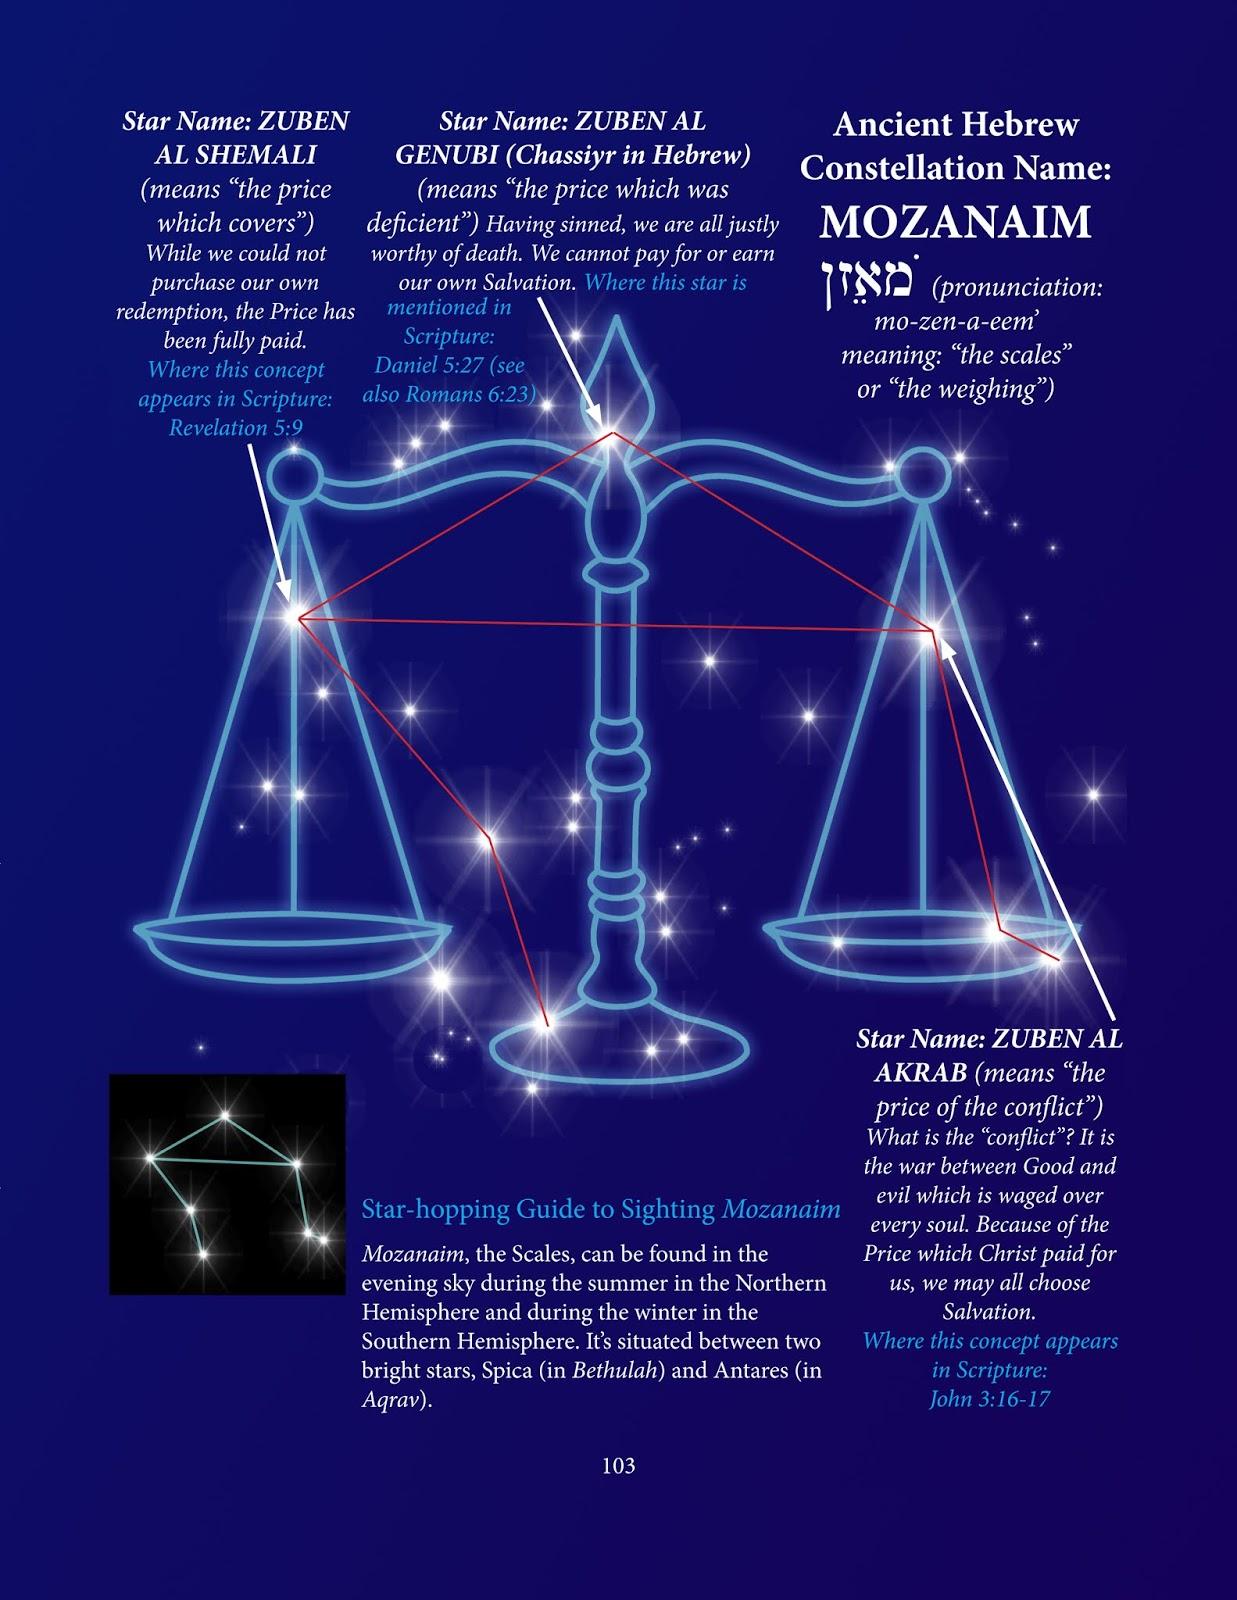 Primary Constellation #2